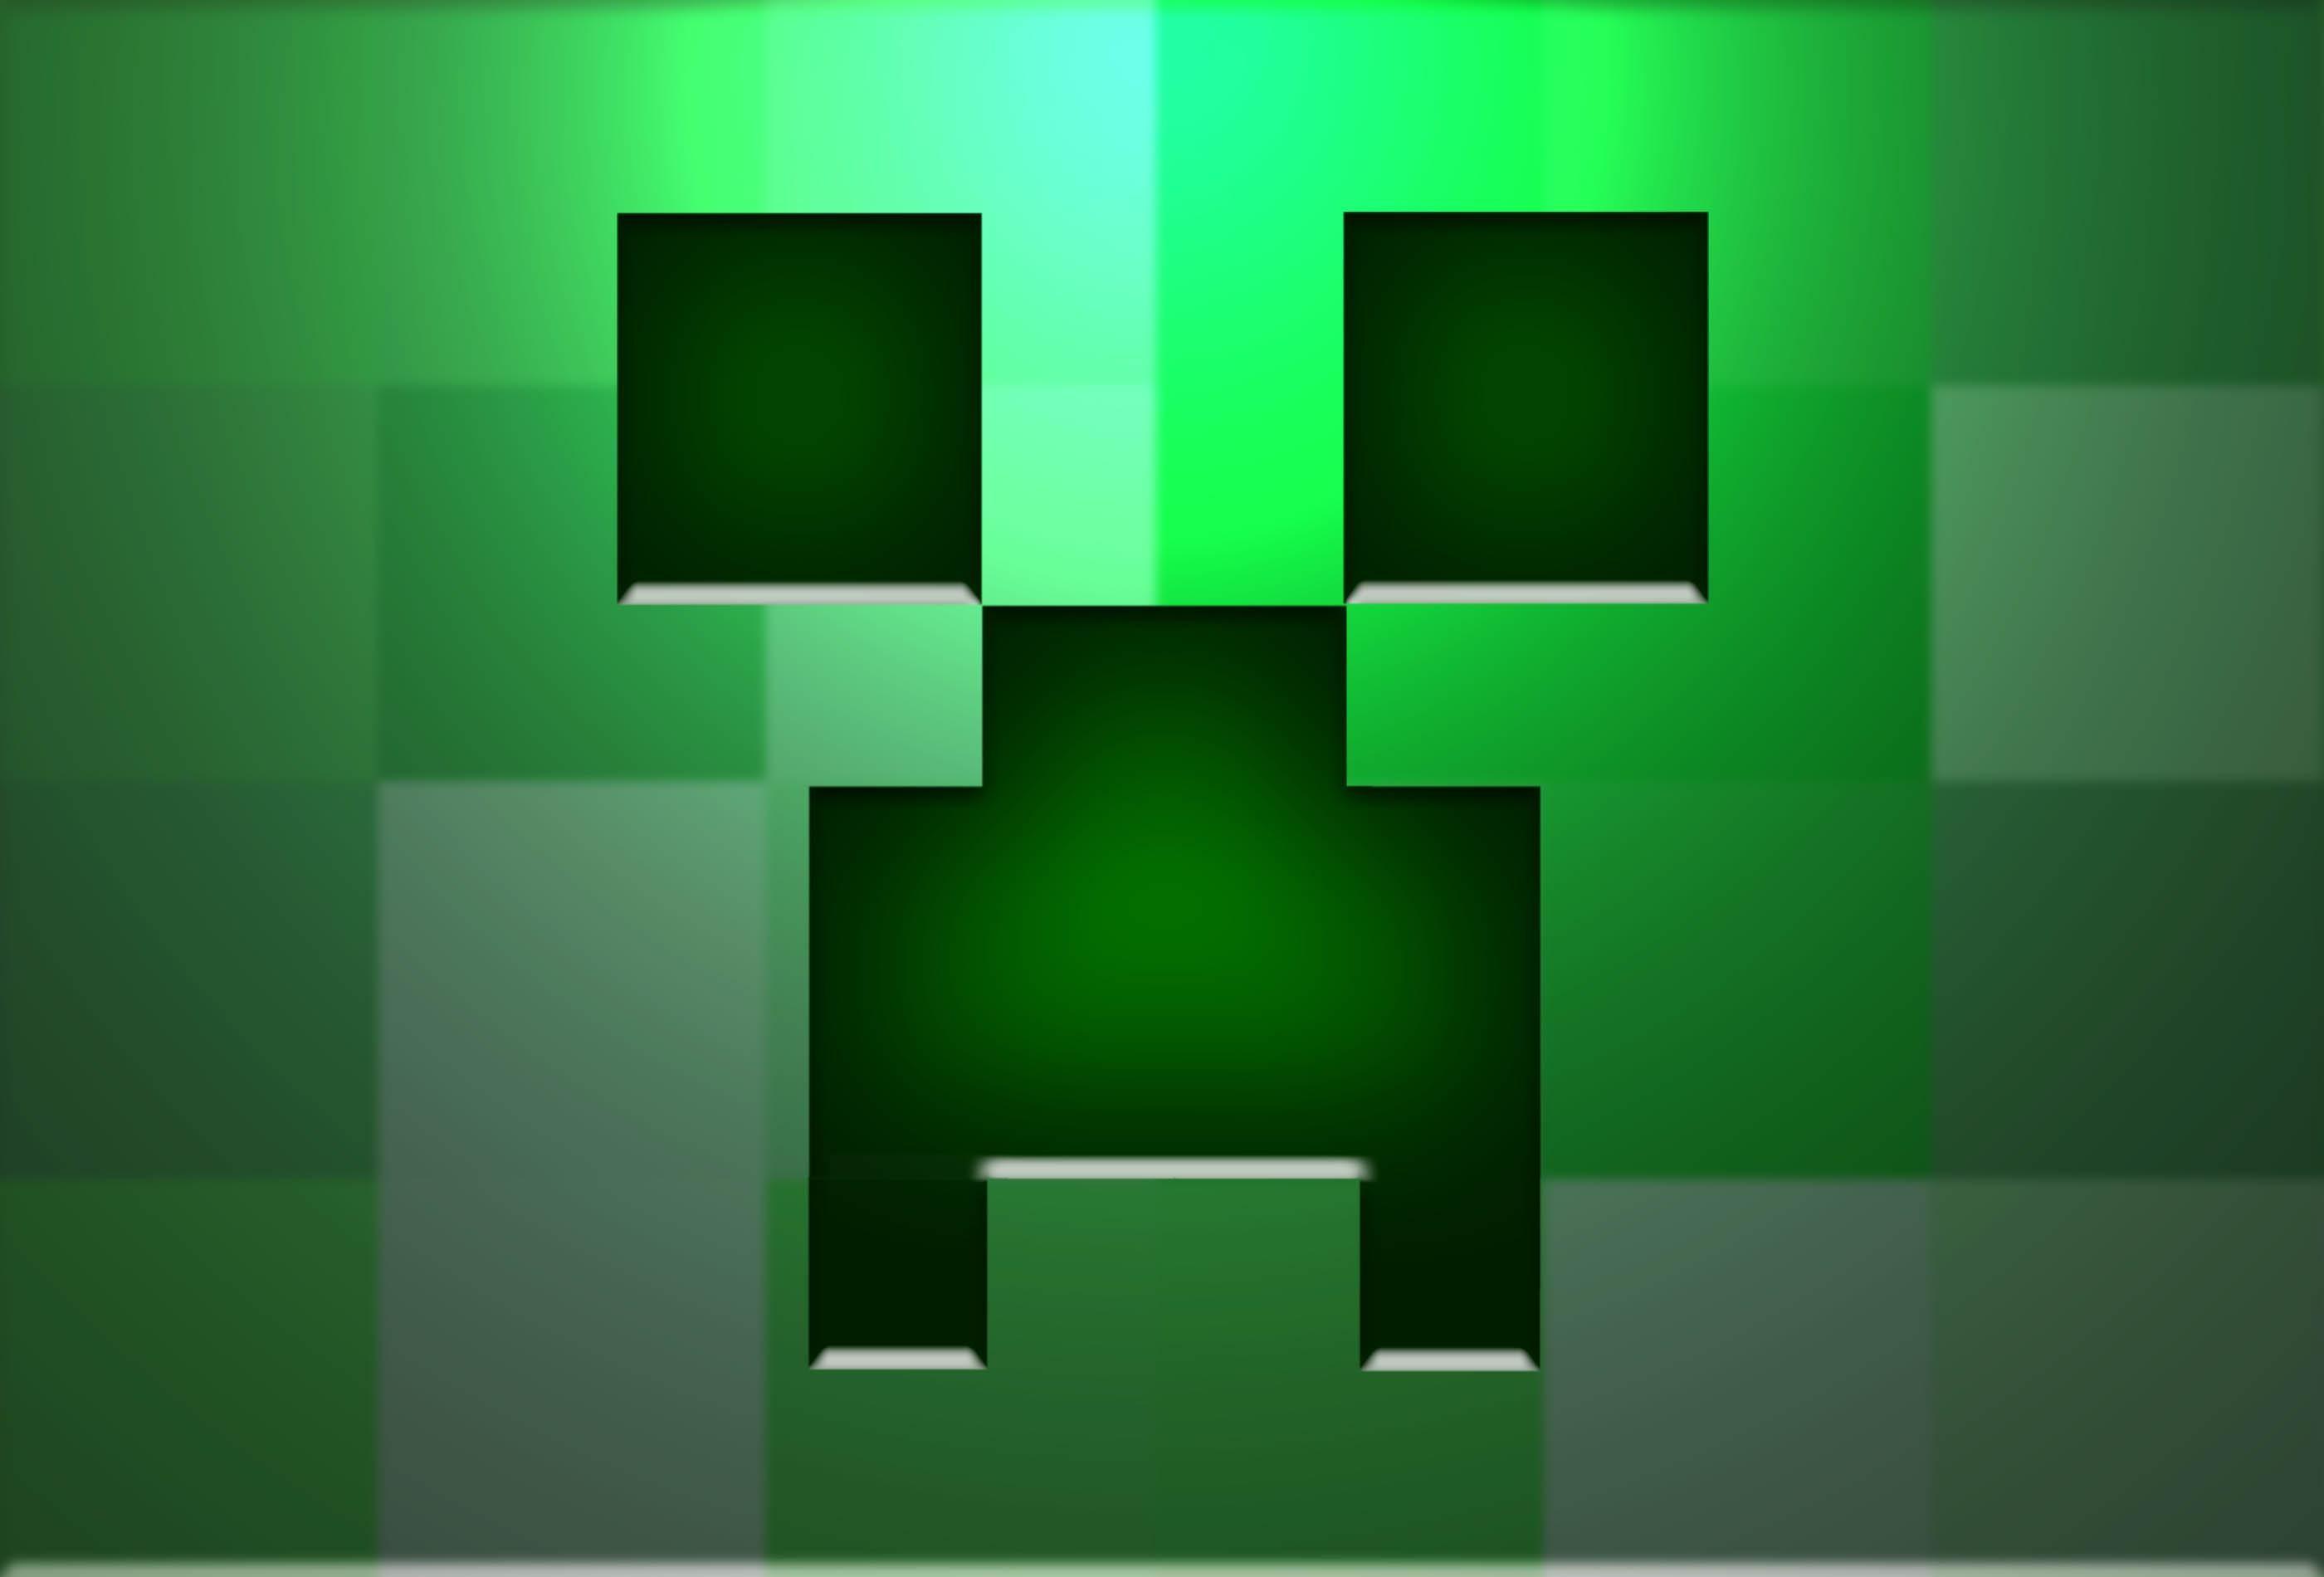 Must see Wallpaper Minecraft Android - 86916c091d4e7d4cf33bb10587717b7b  HD_725542.jpg